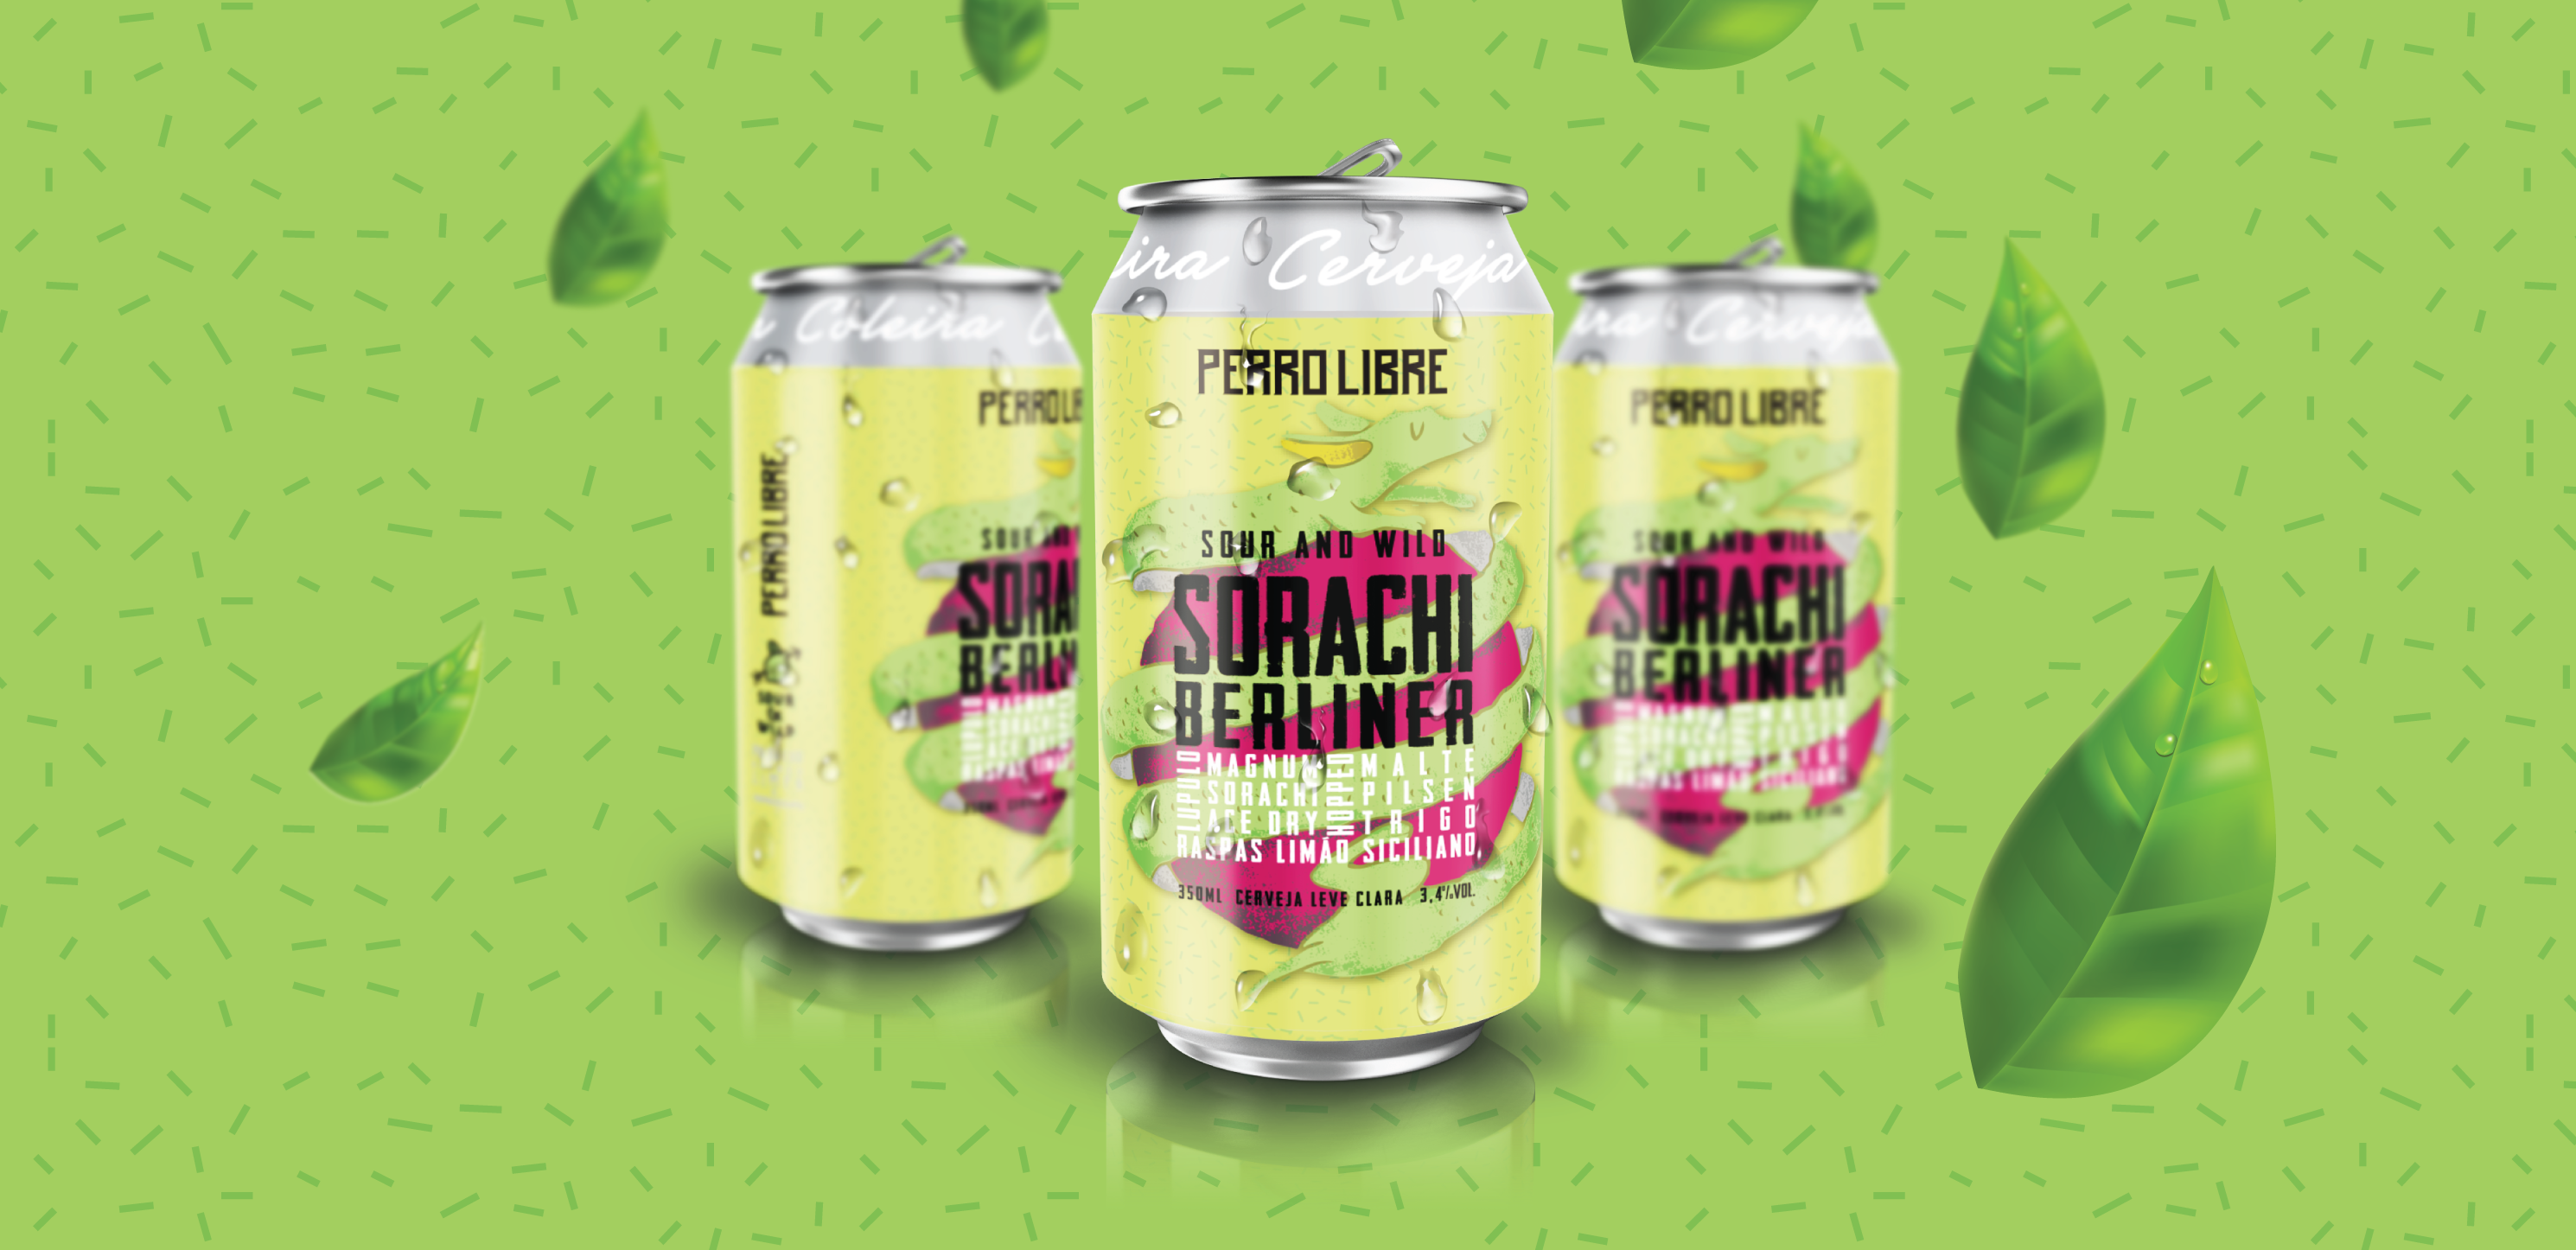 Design packing Cerveja Perro Libre Sorachi Berlinder Lata - Perro Libre